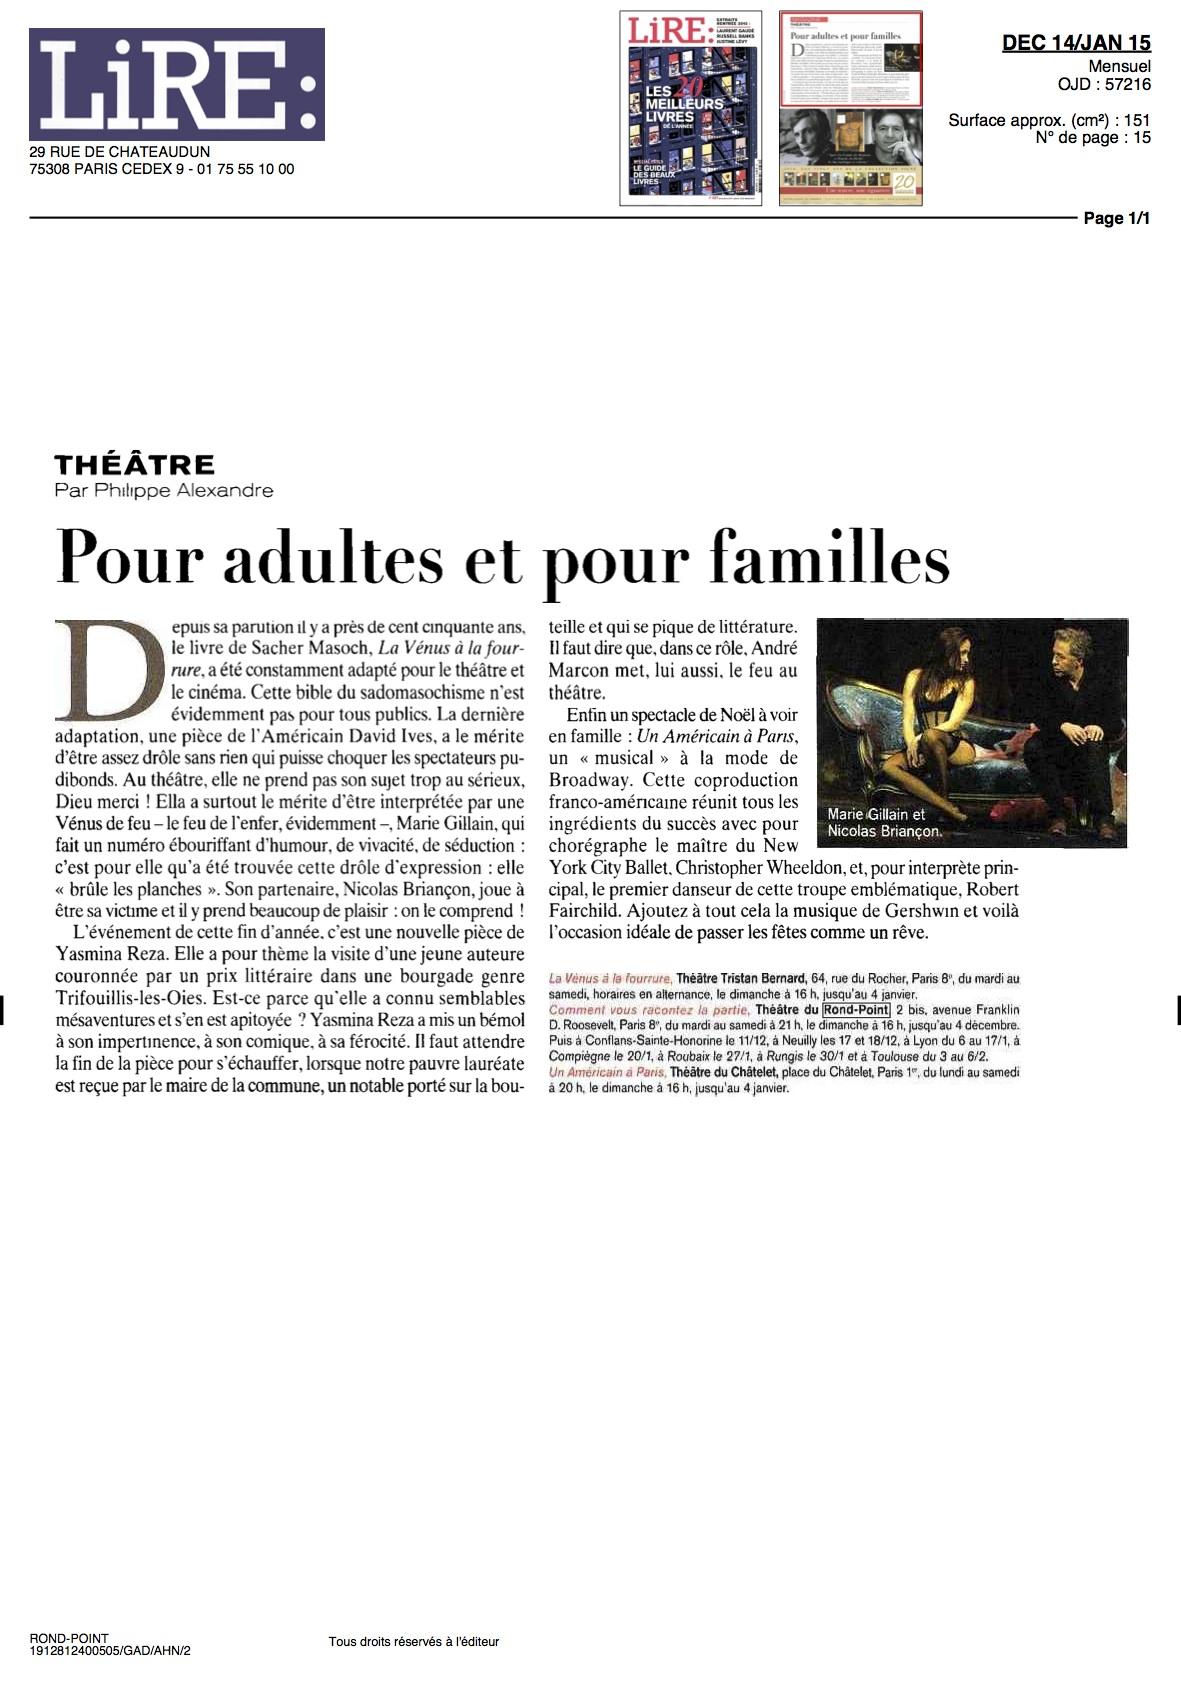 LIRE Magazine 27.11.14